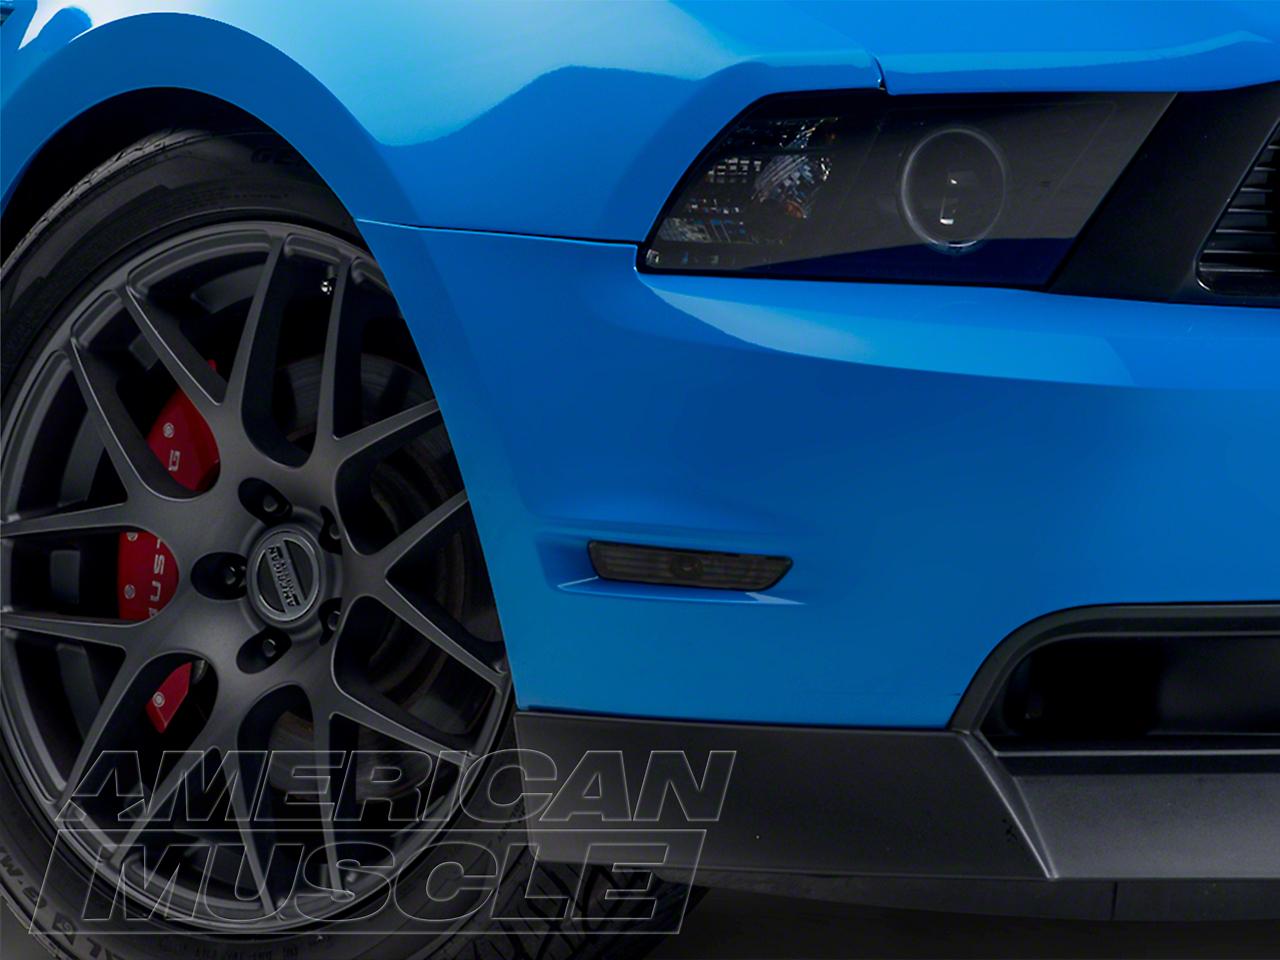 Axial Black Side Marker Lights (10-14 GT, V6)